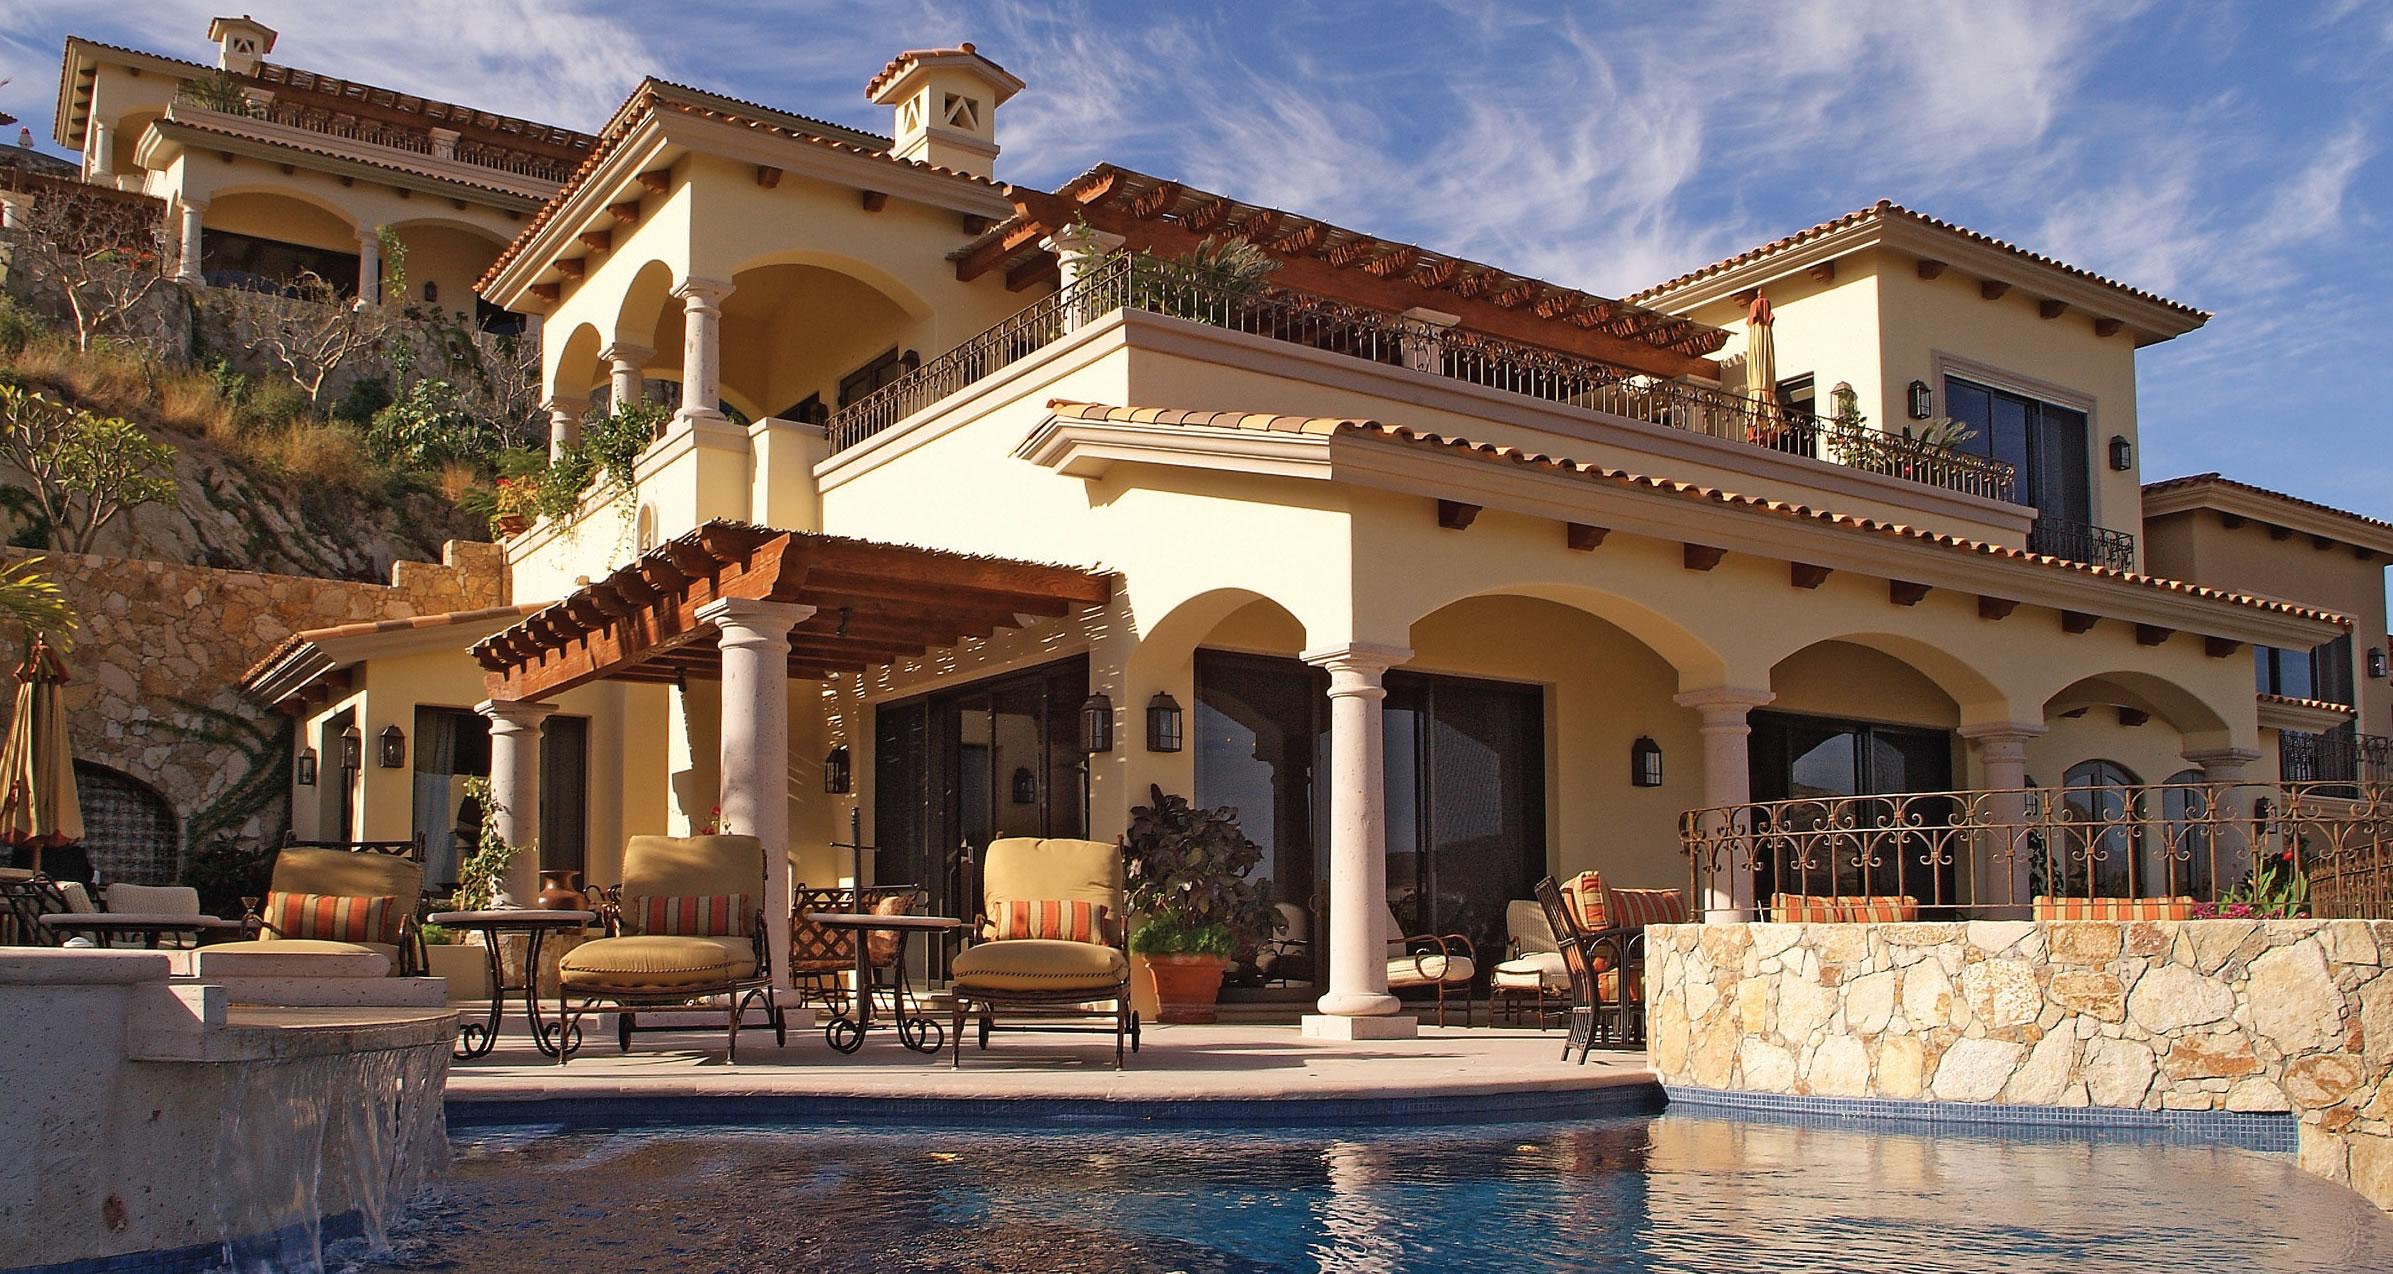 Inside Los Angeles Multi Million Dollar Mansions HD Walls Find